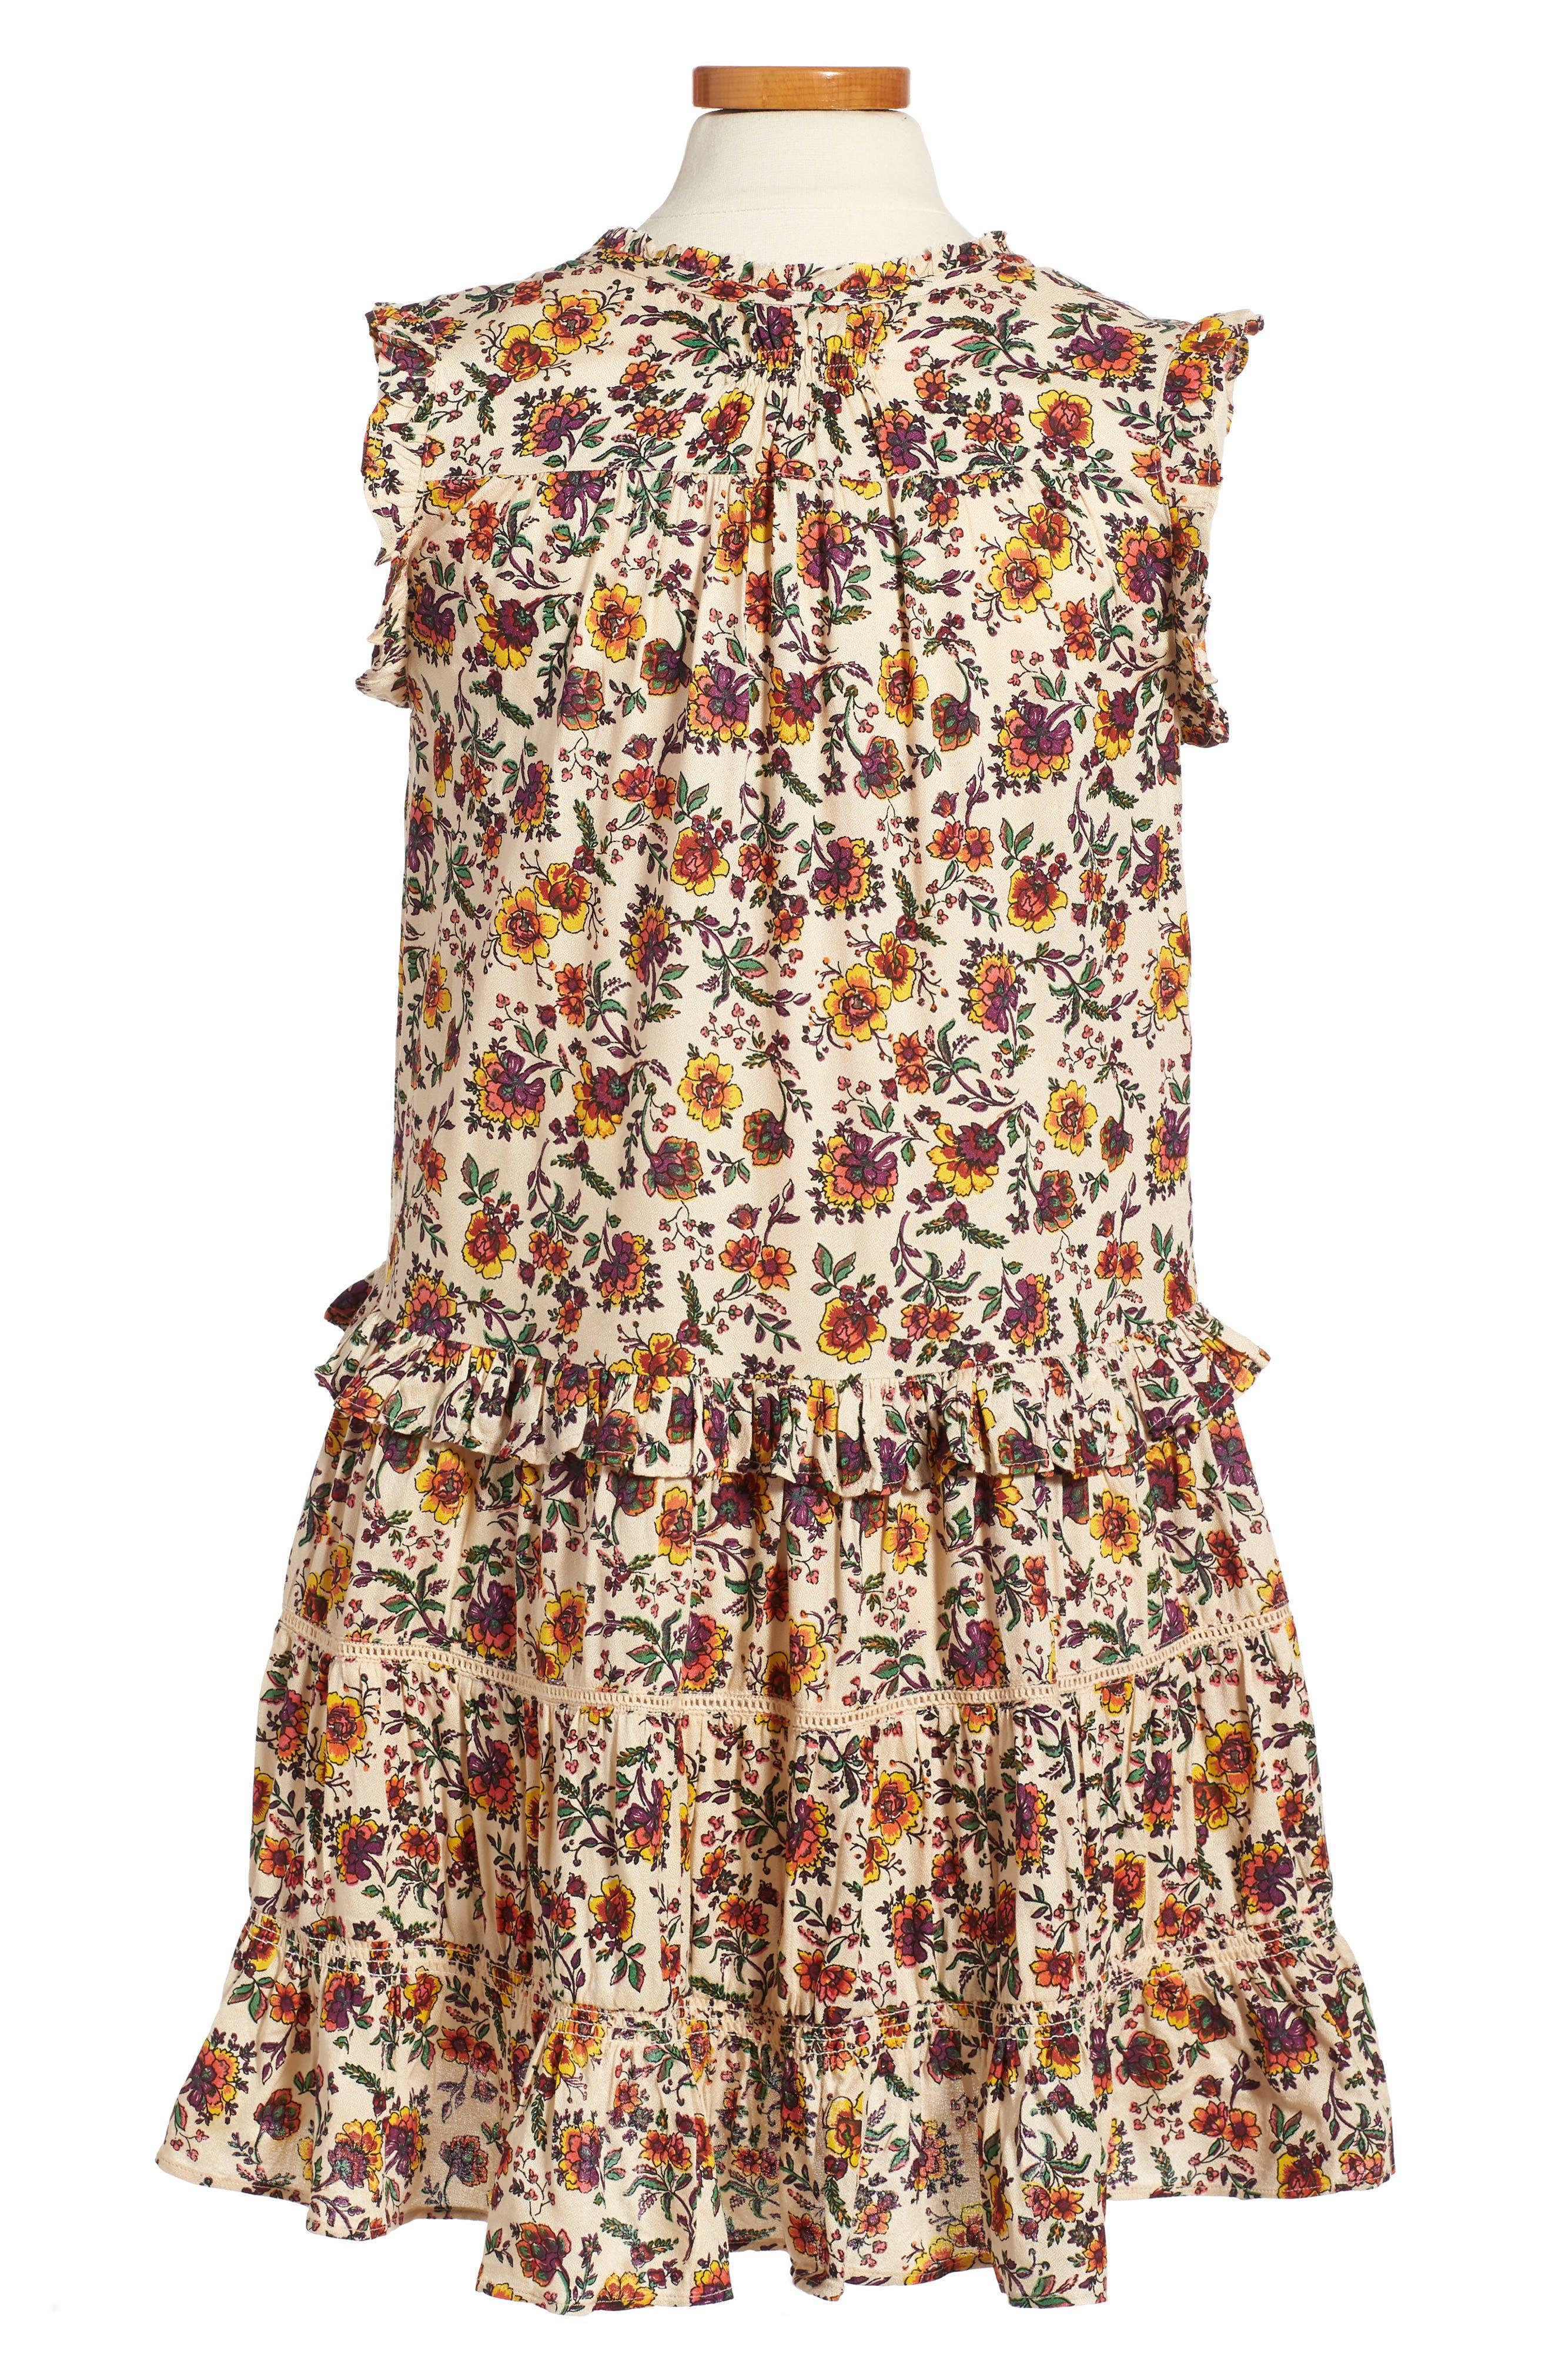 Natalie Print Dress,                             Alternate thumbnail 2, color,                             905